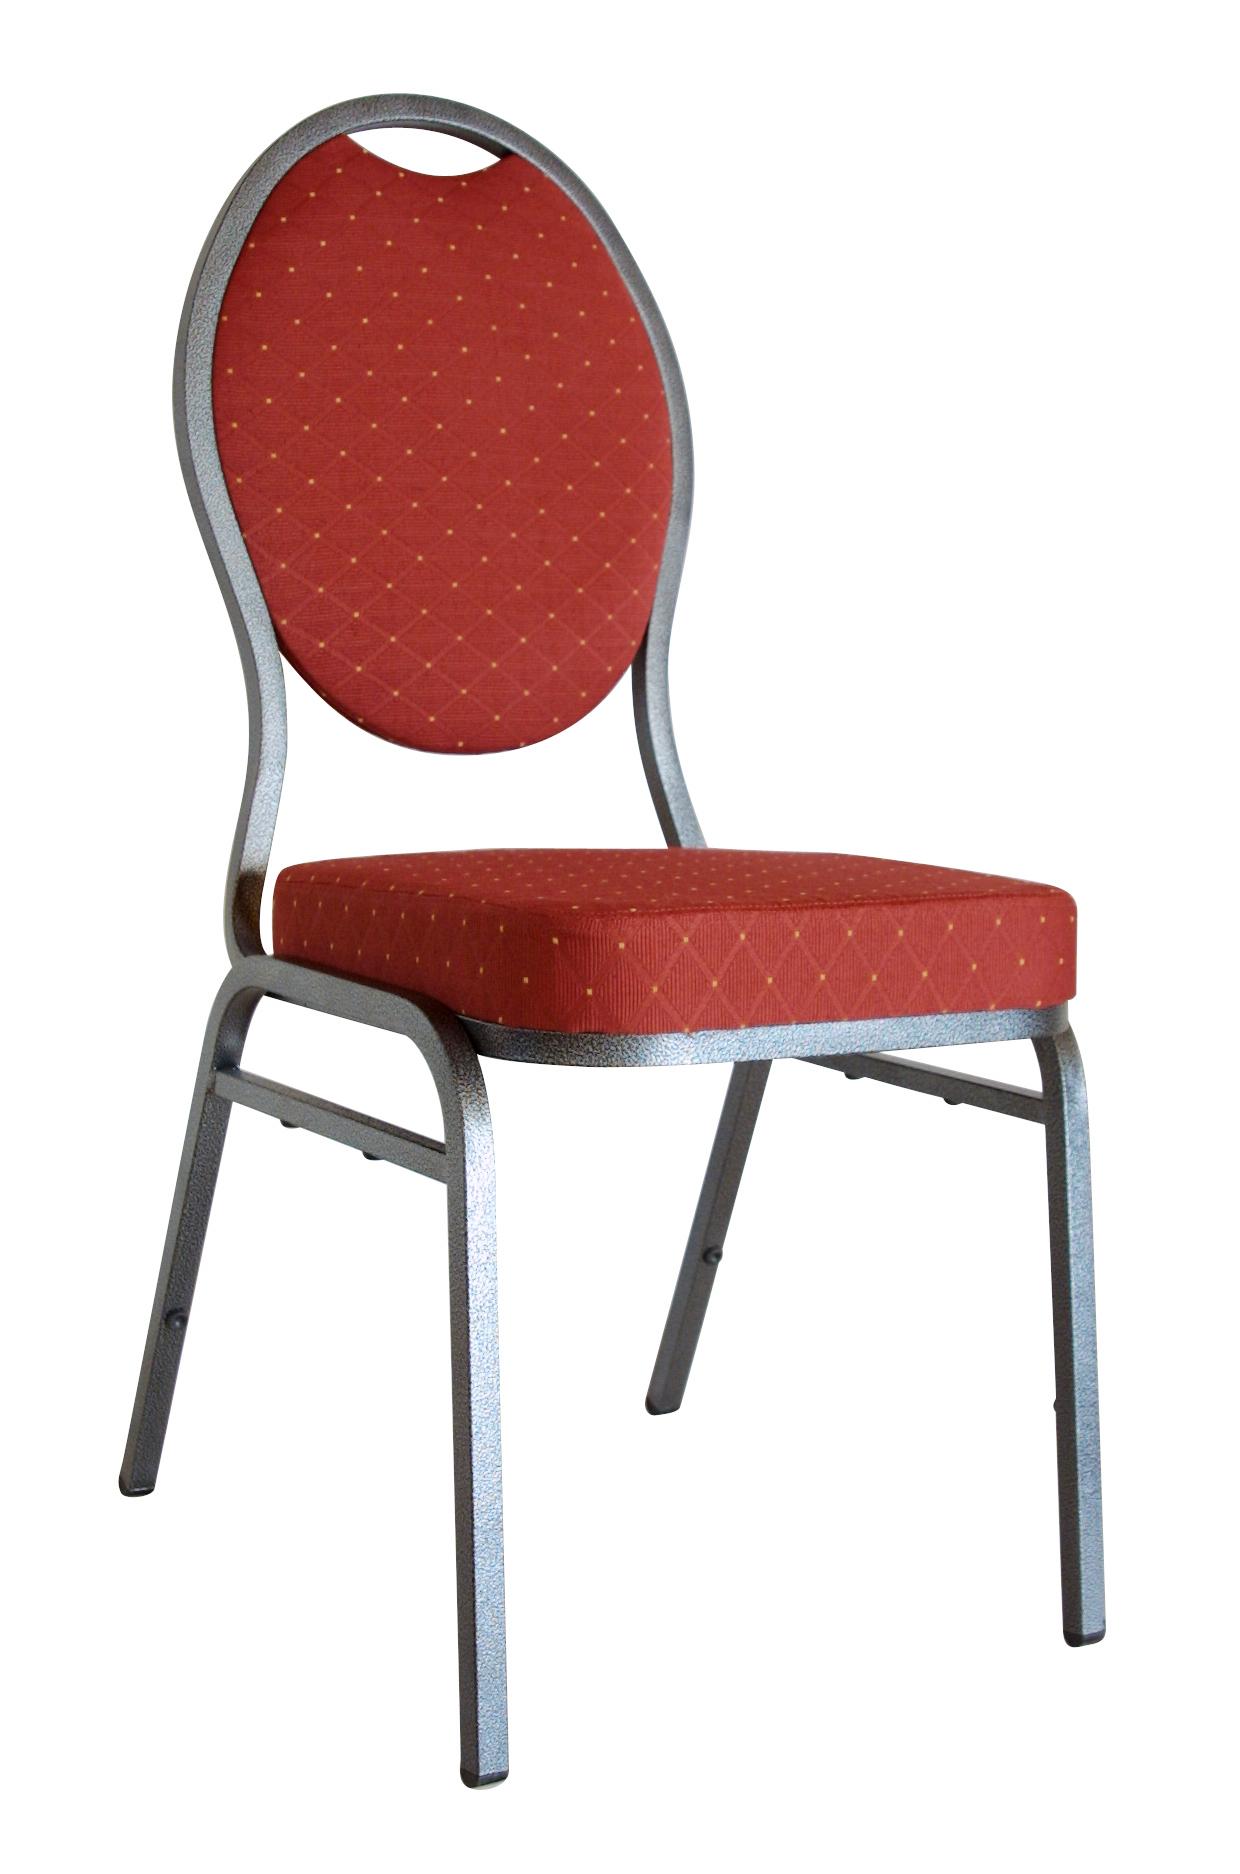 Stuhl zur Miete